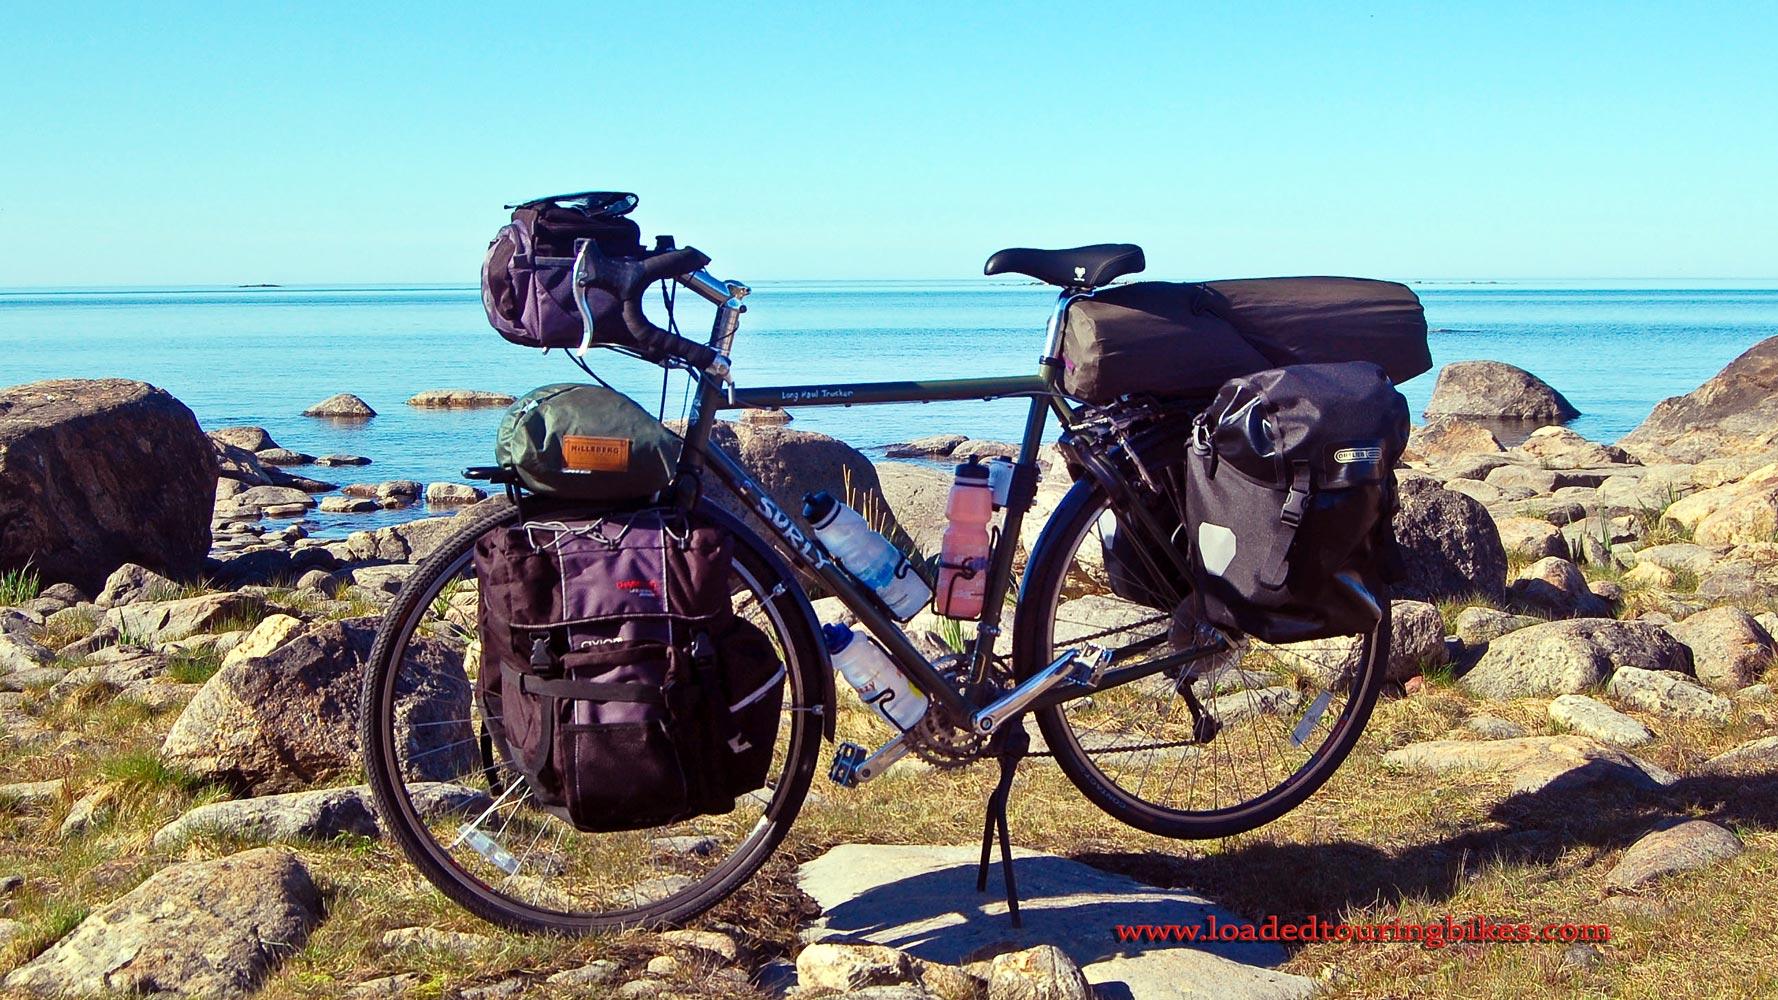 407    Matias touring Finland - Surly Long Haul Trucker touring bike